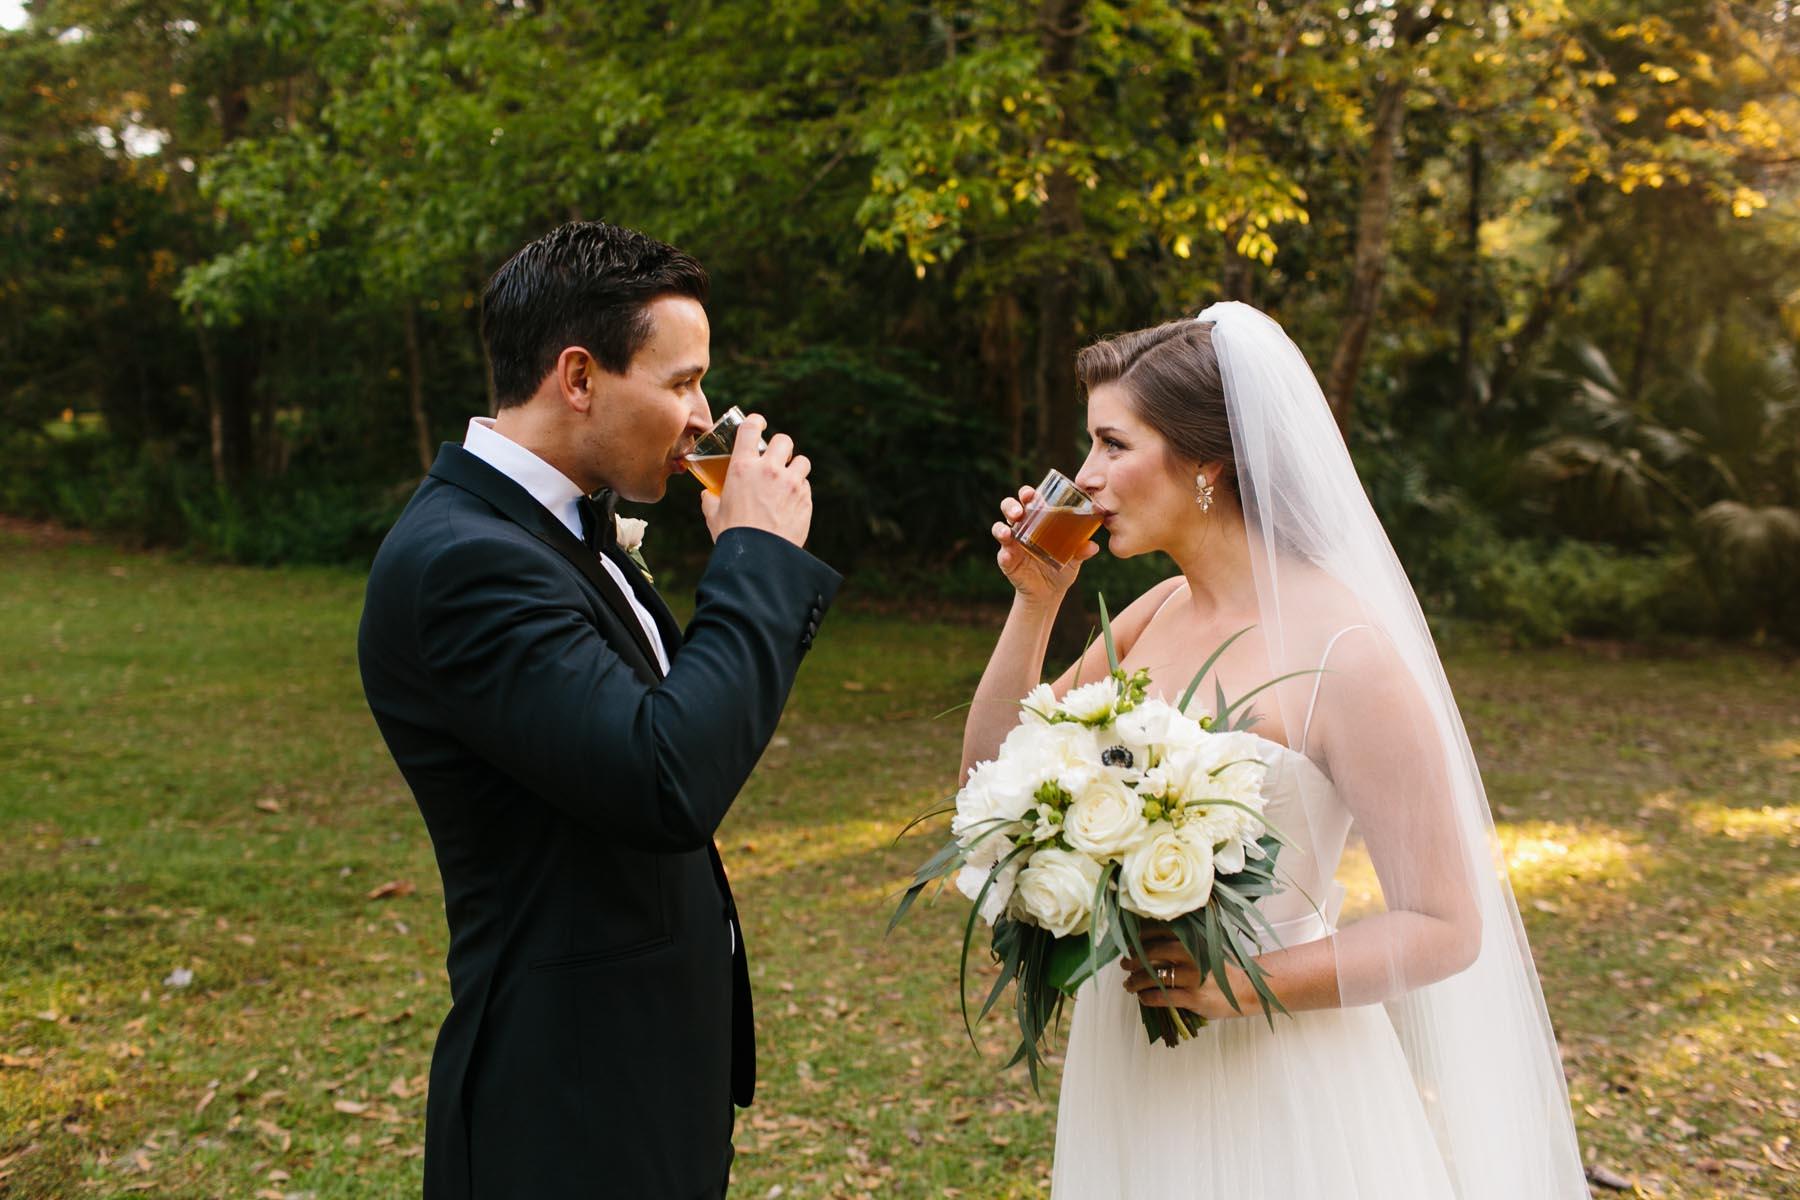 lowry wedding blog eden garden florida wedding-88